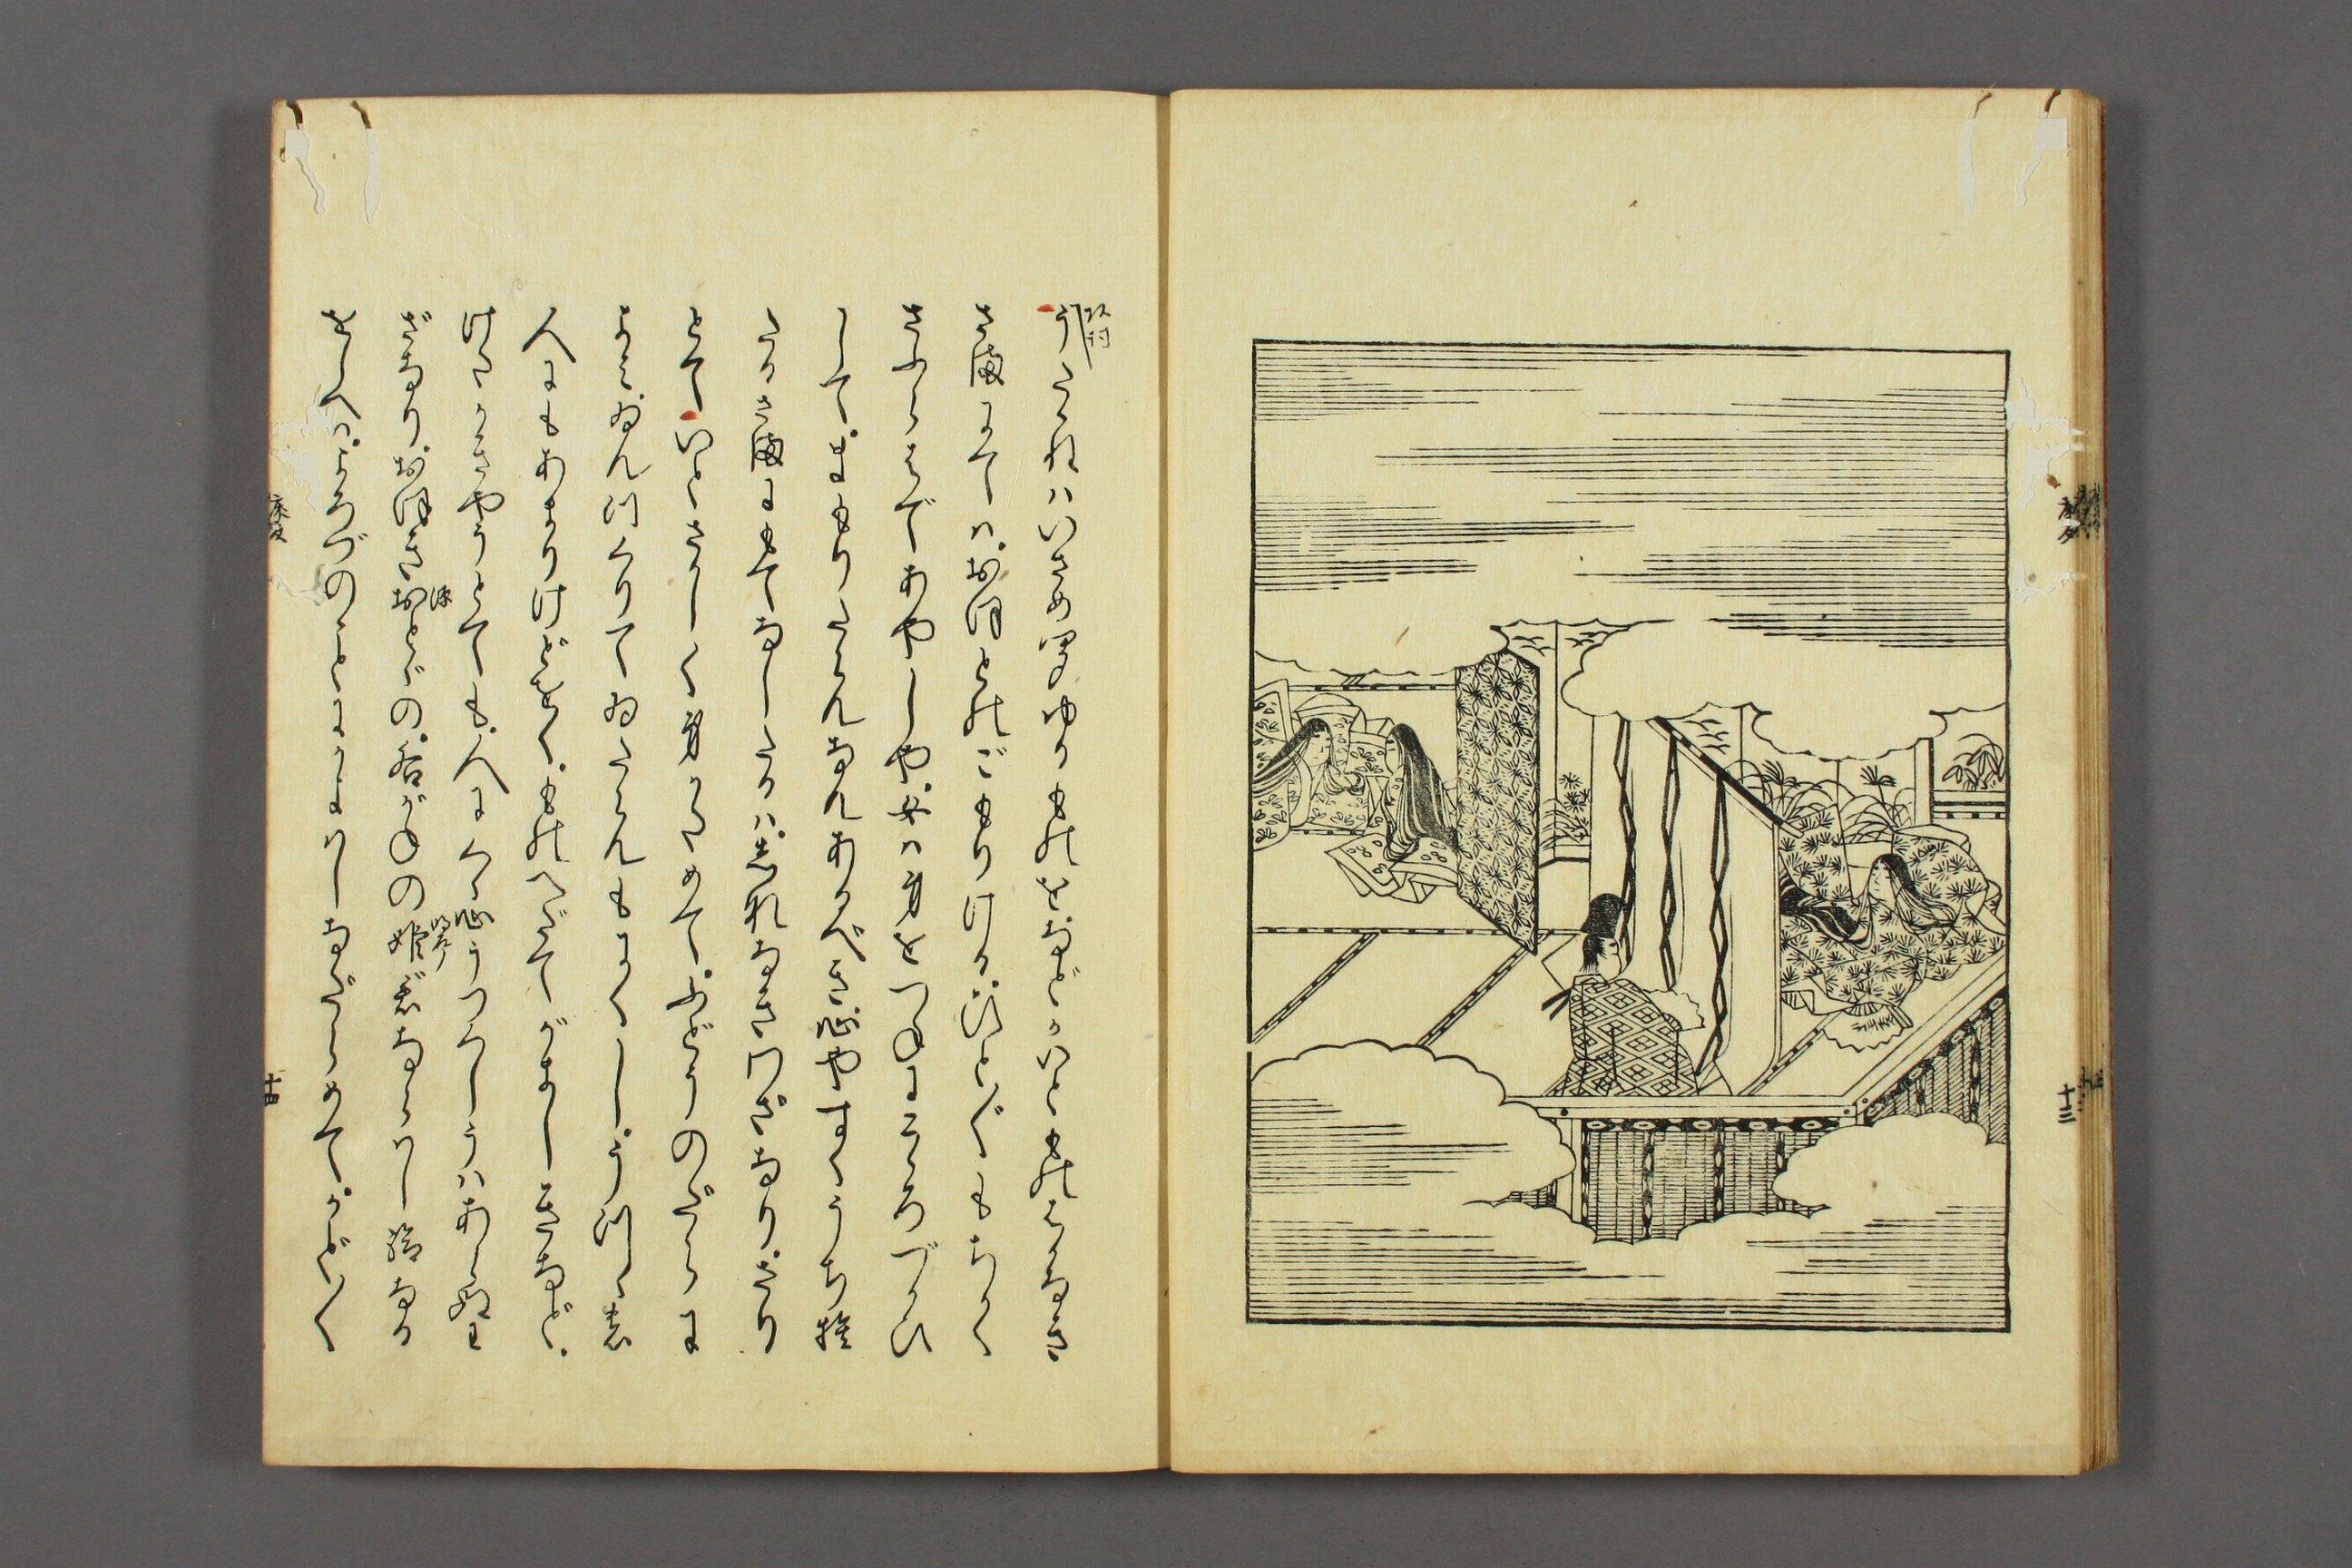 http://archive.wul.waseda.ac.jp/kosho/bunko30/bunko30_a0007/bunko30_a0007_0026/bunko30_a0007_0026_p0015.jpg